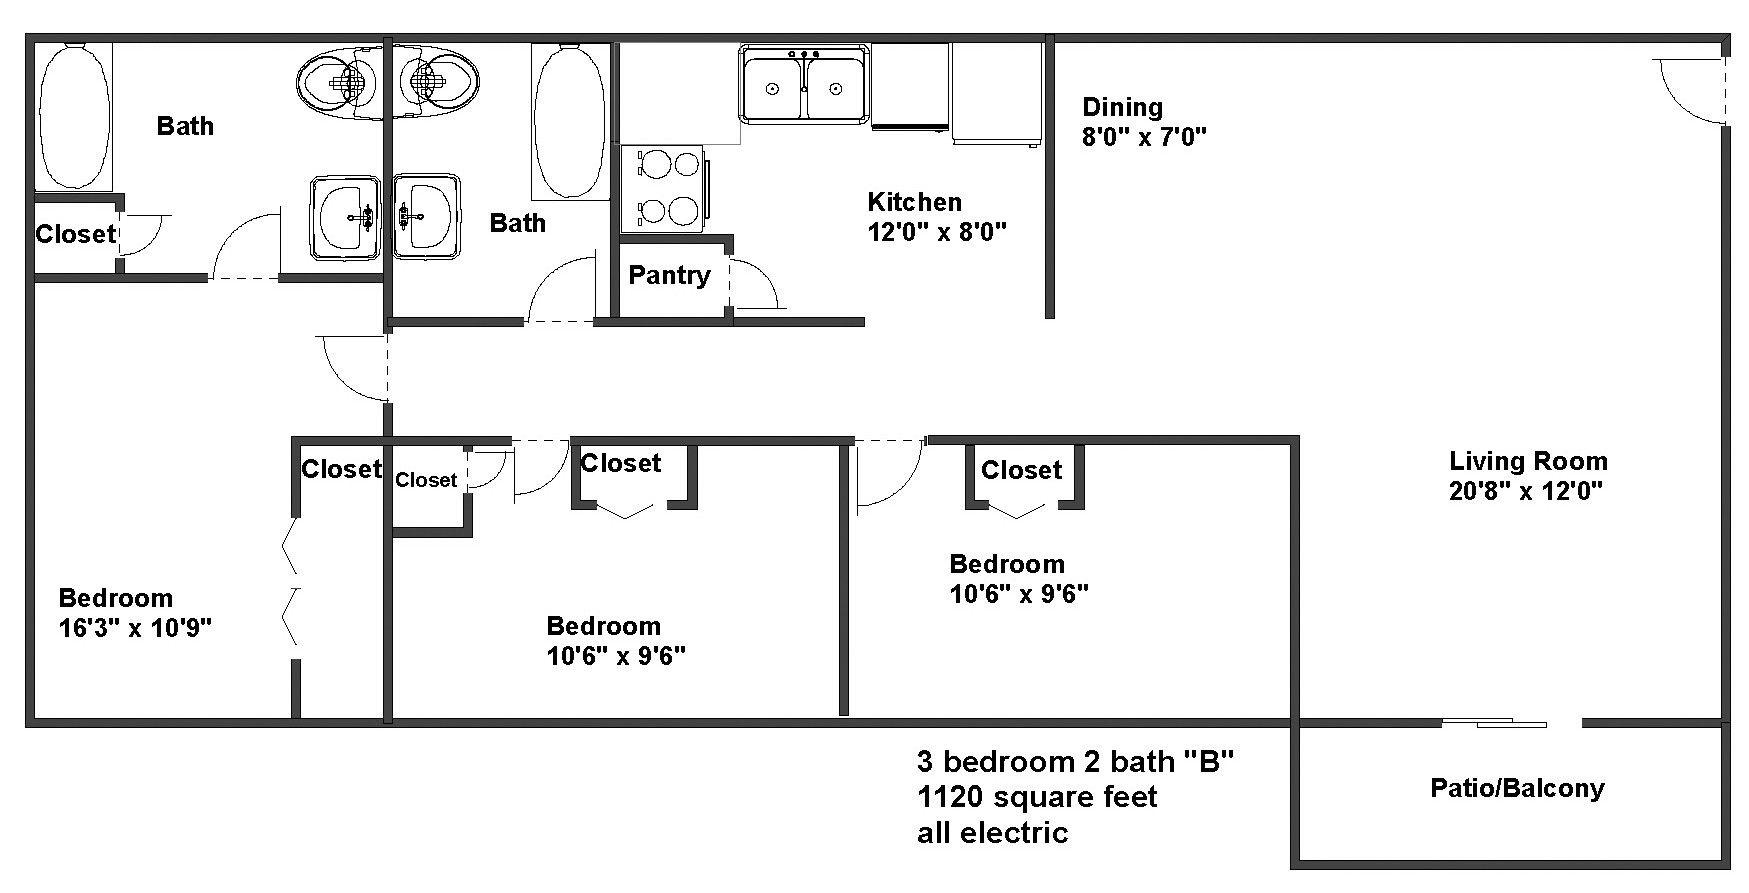 50 1000 Sq Ft House Plans 3 Bedroom Qp3m di 2020